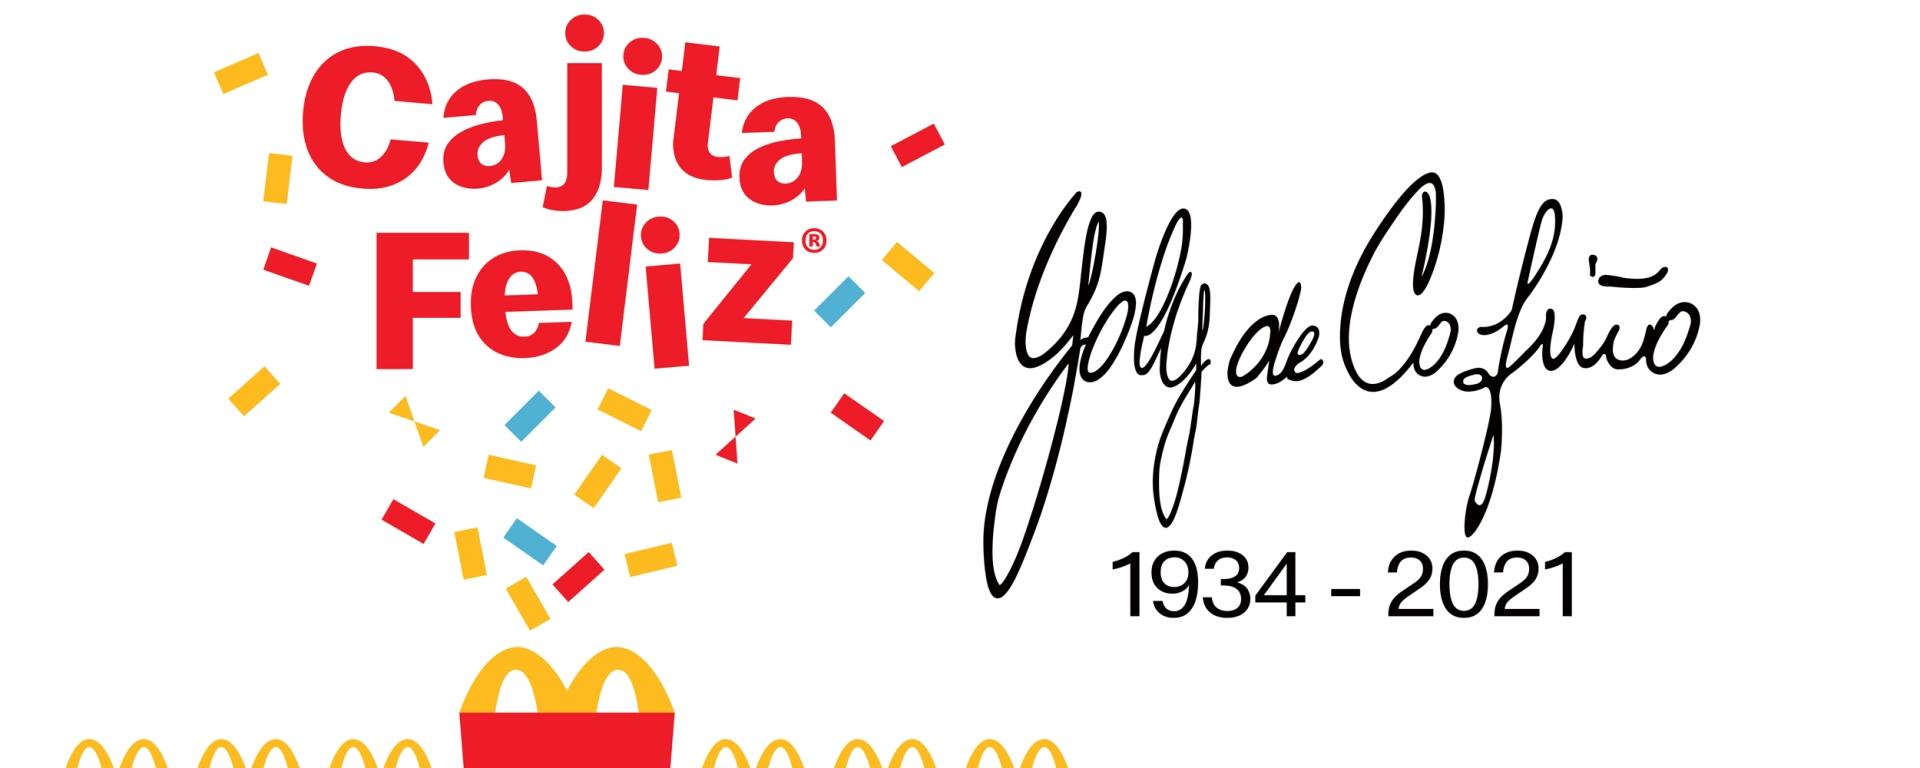 Cajita Feliz homenaje Doña Yoly 2